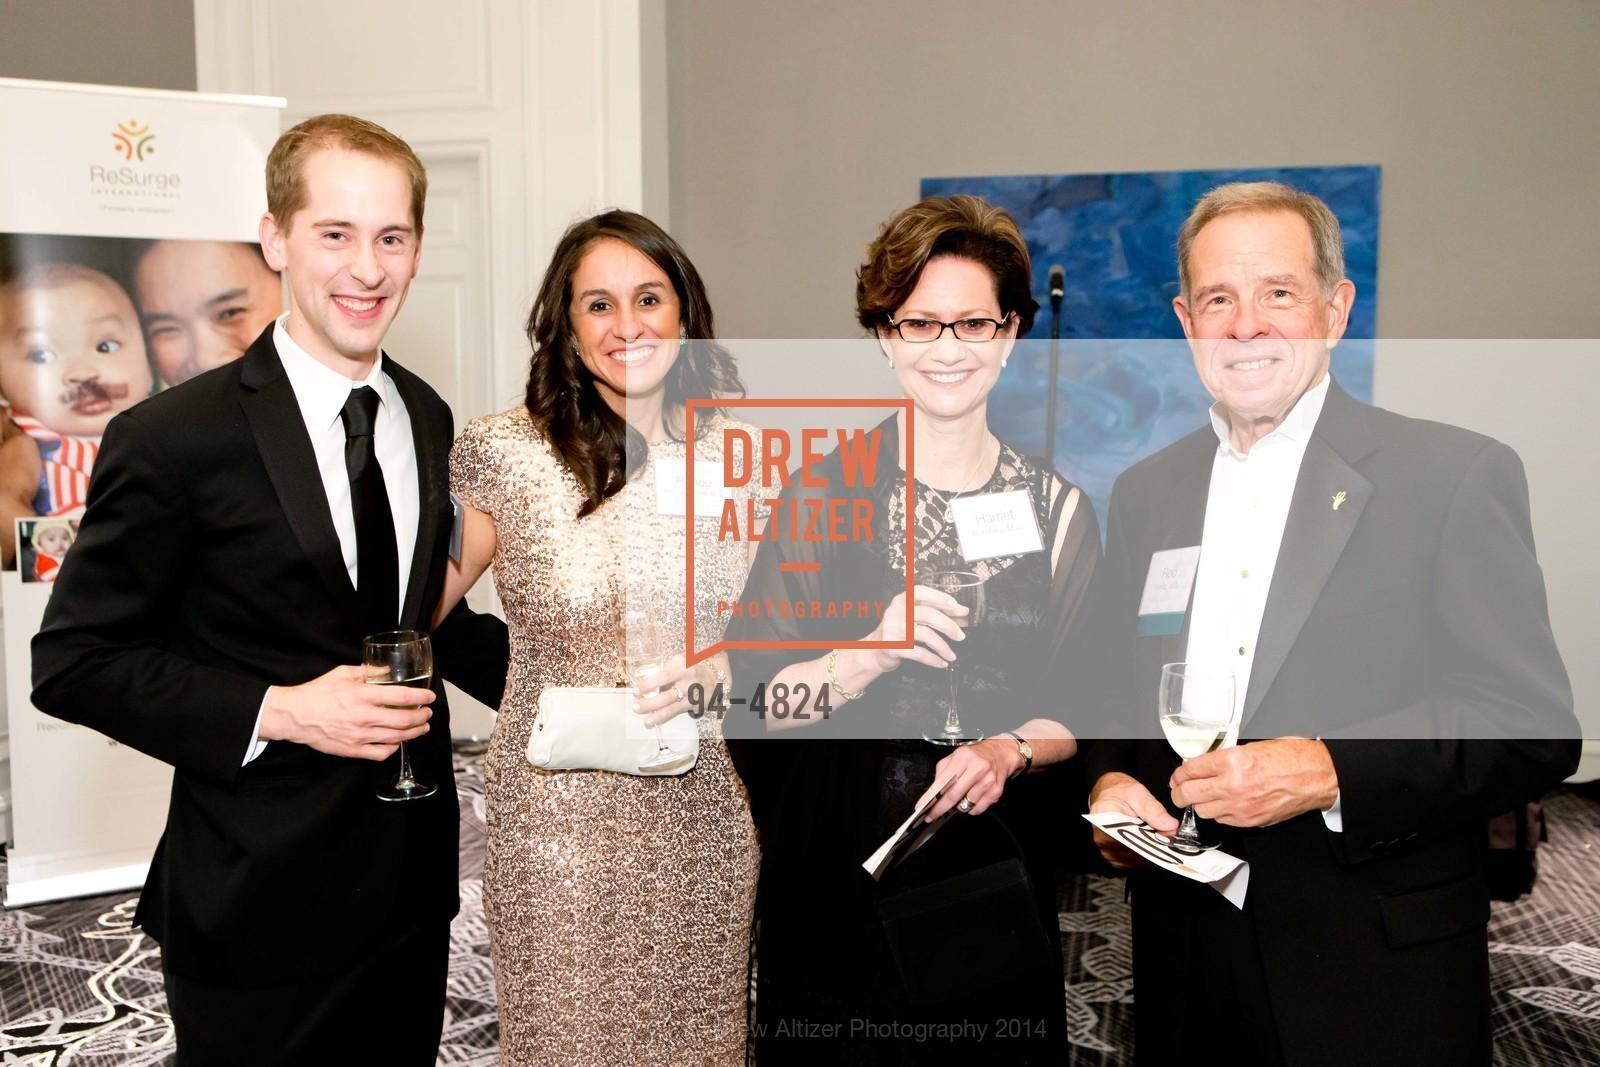 John Paro, Renee Rodriguez Paro, Harriet Borofsky, Rod Hentz, Photo #94-4824